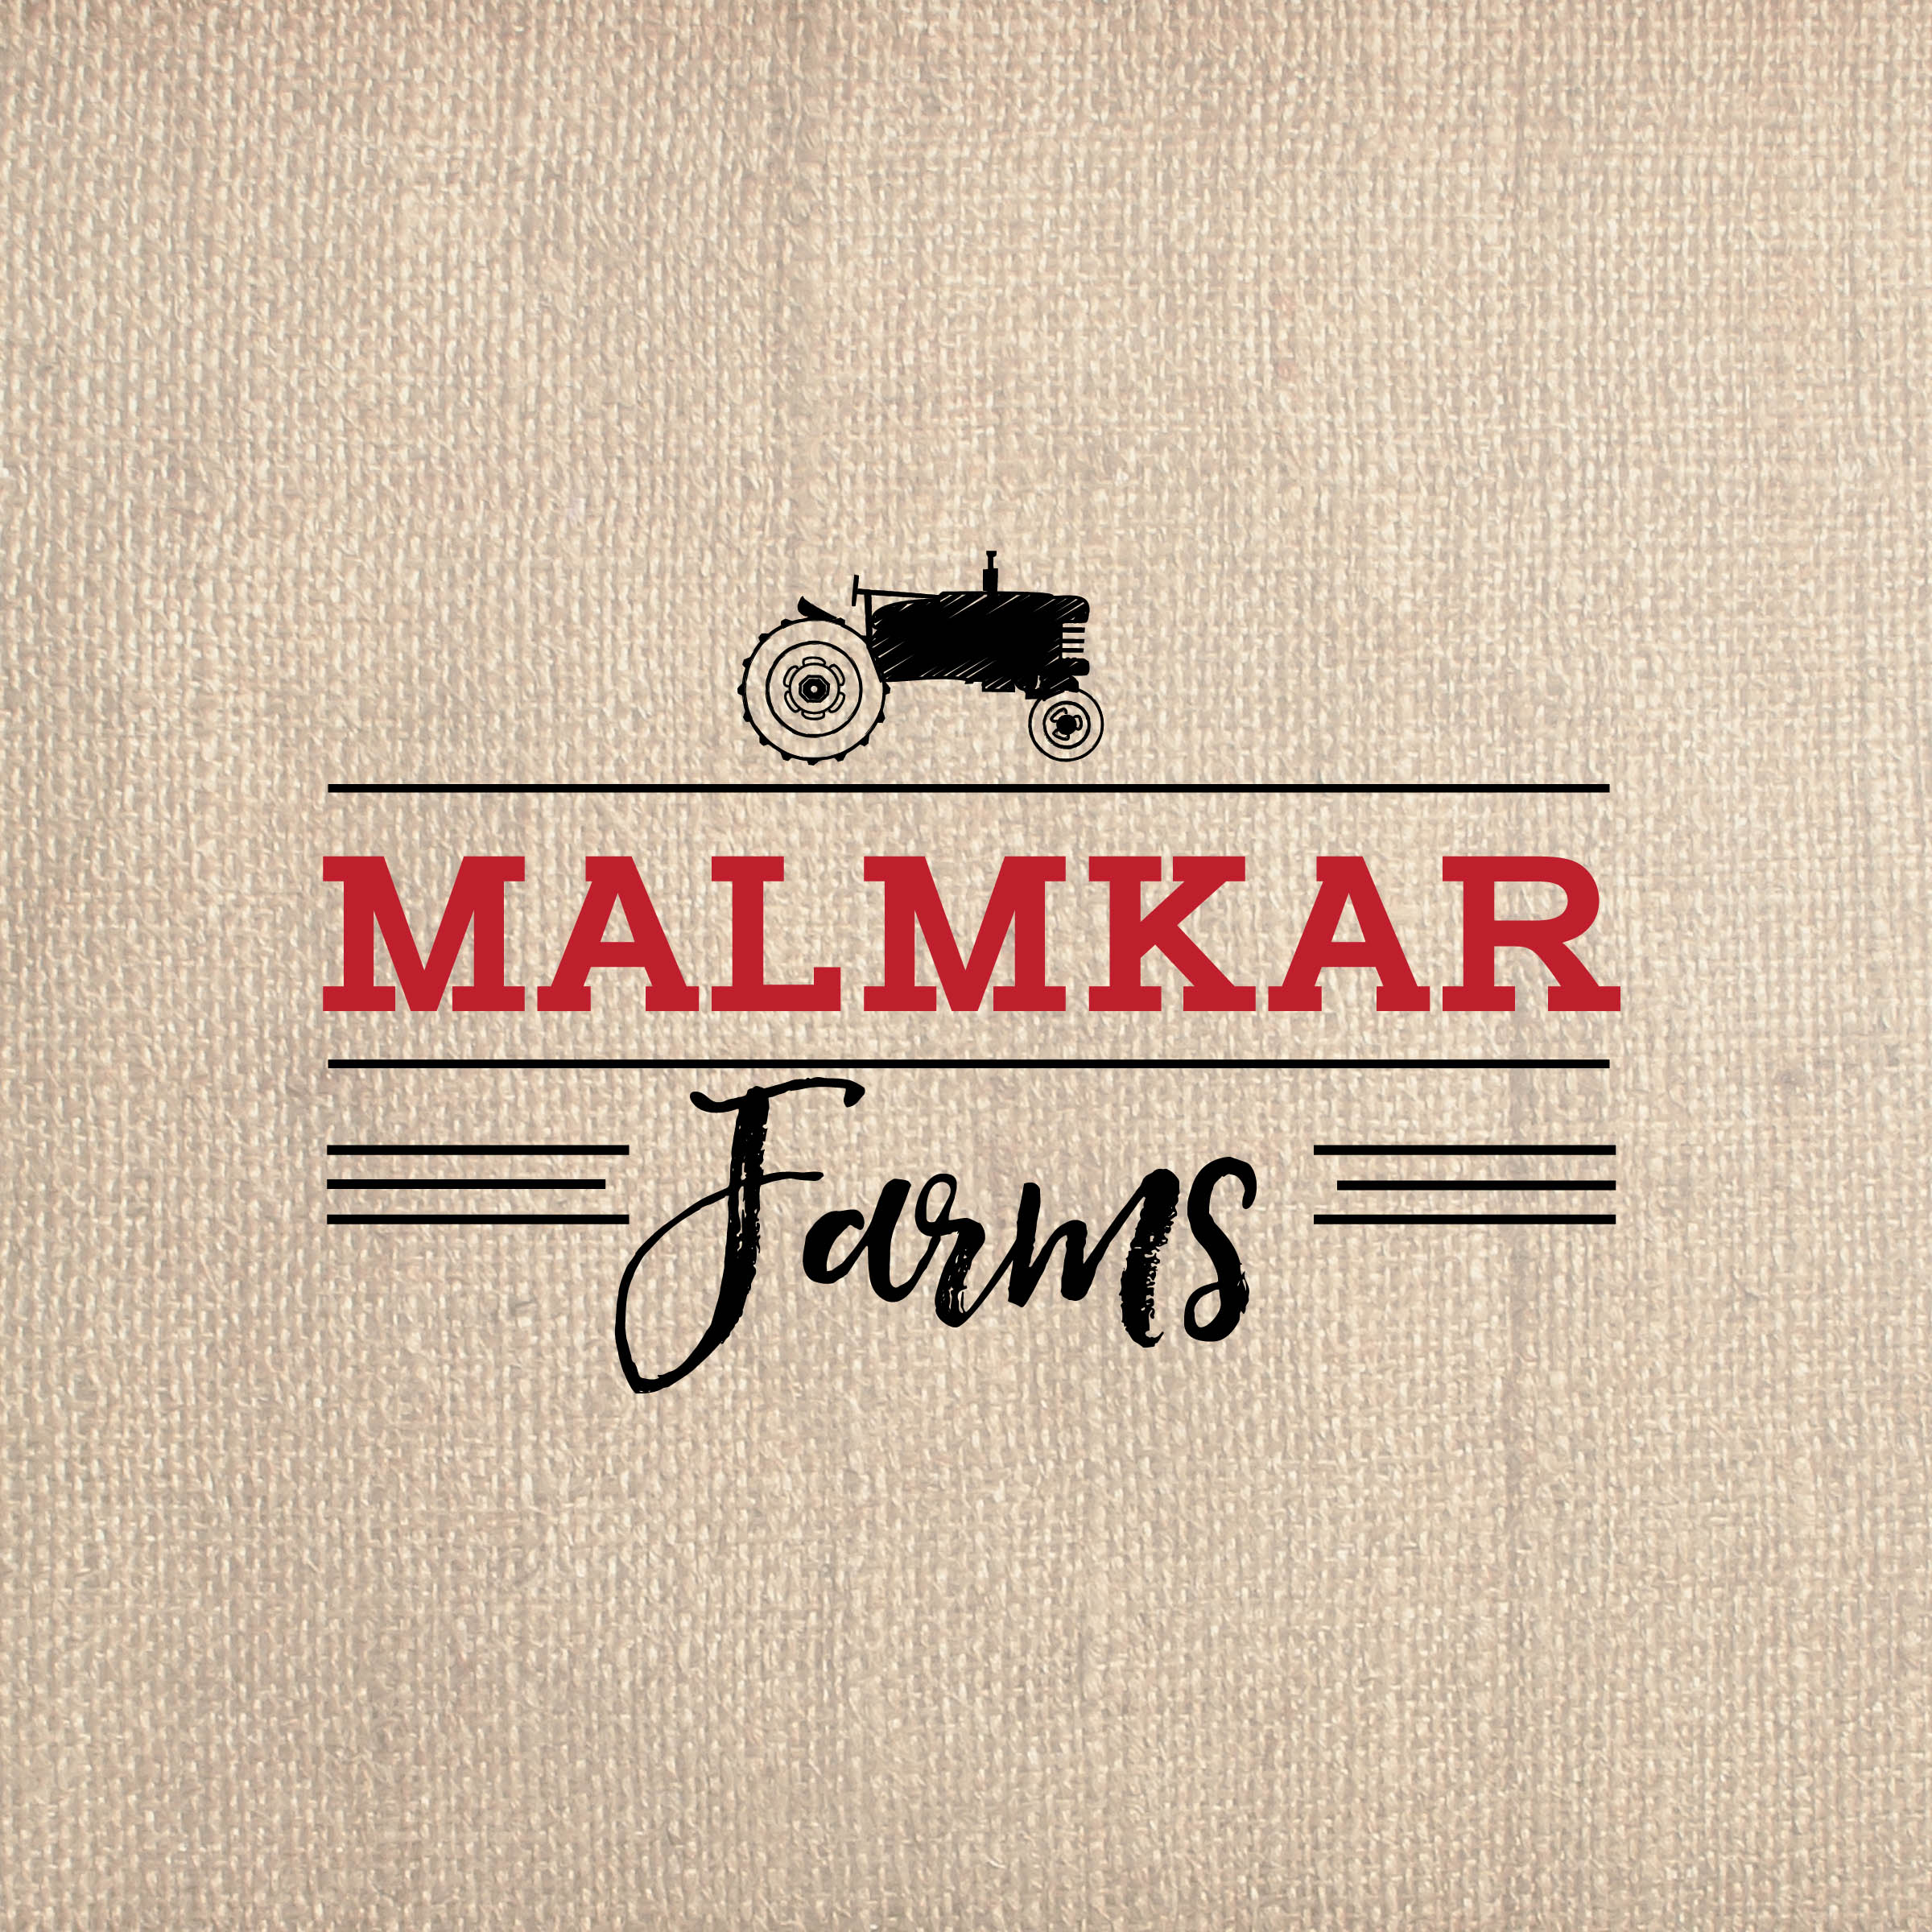 Malmkar Farms